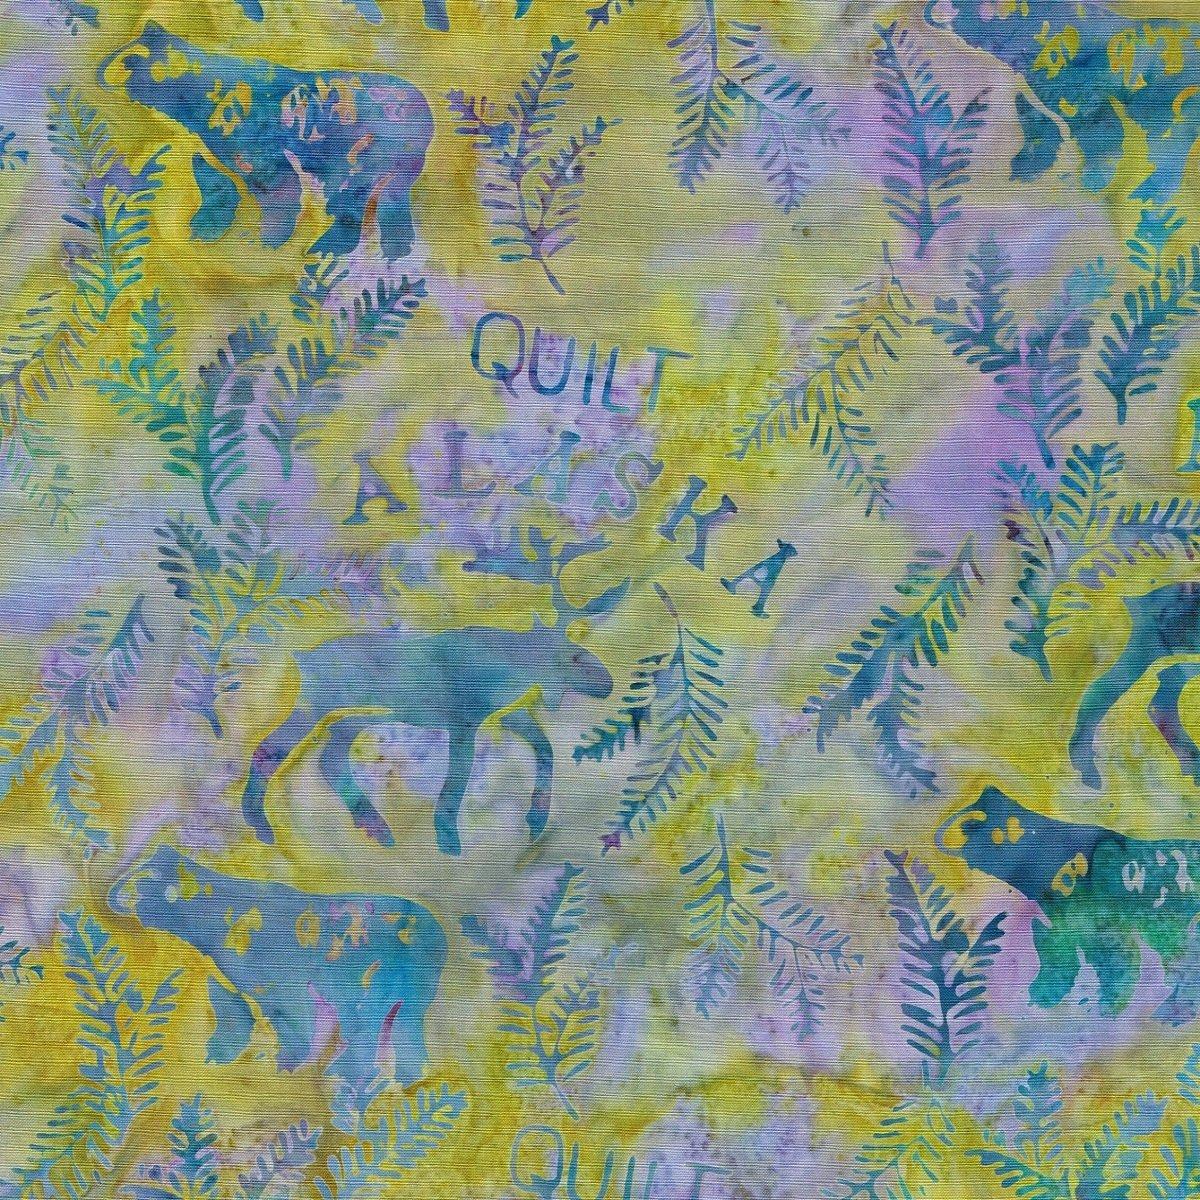 QuiltAlaska Batik SH42-C2 Lt Blue Lime